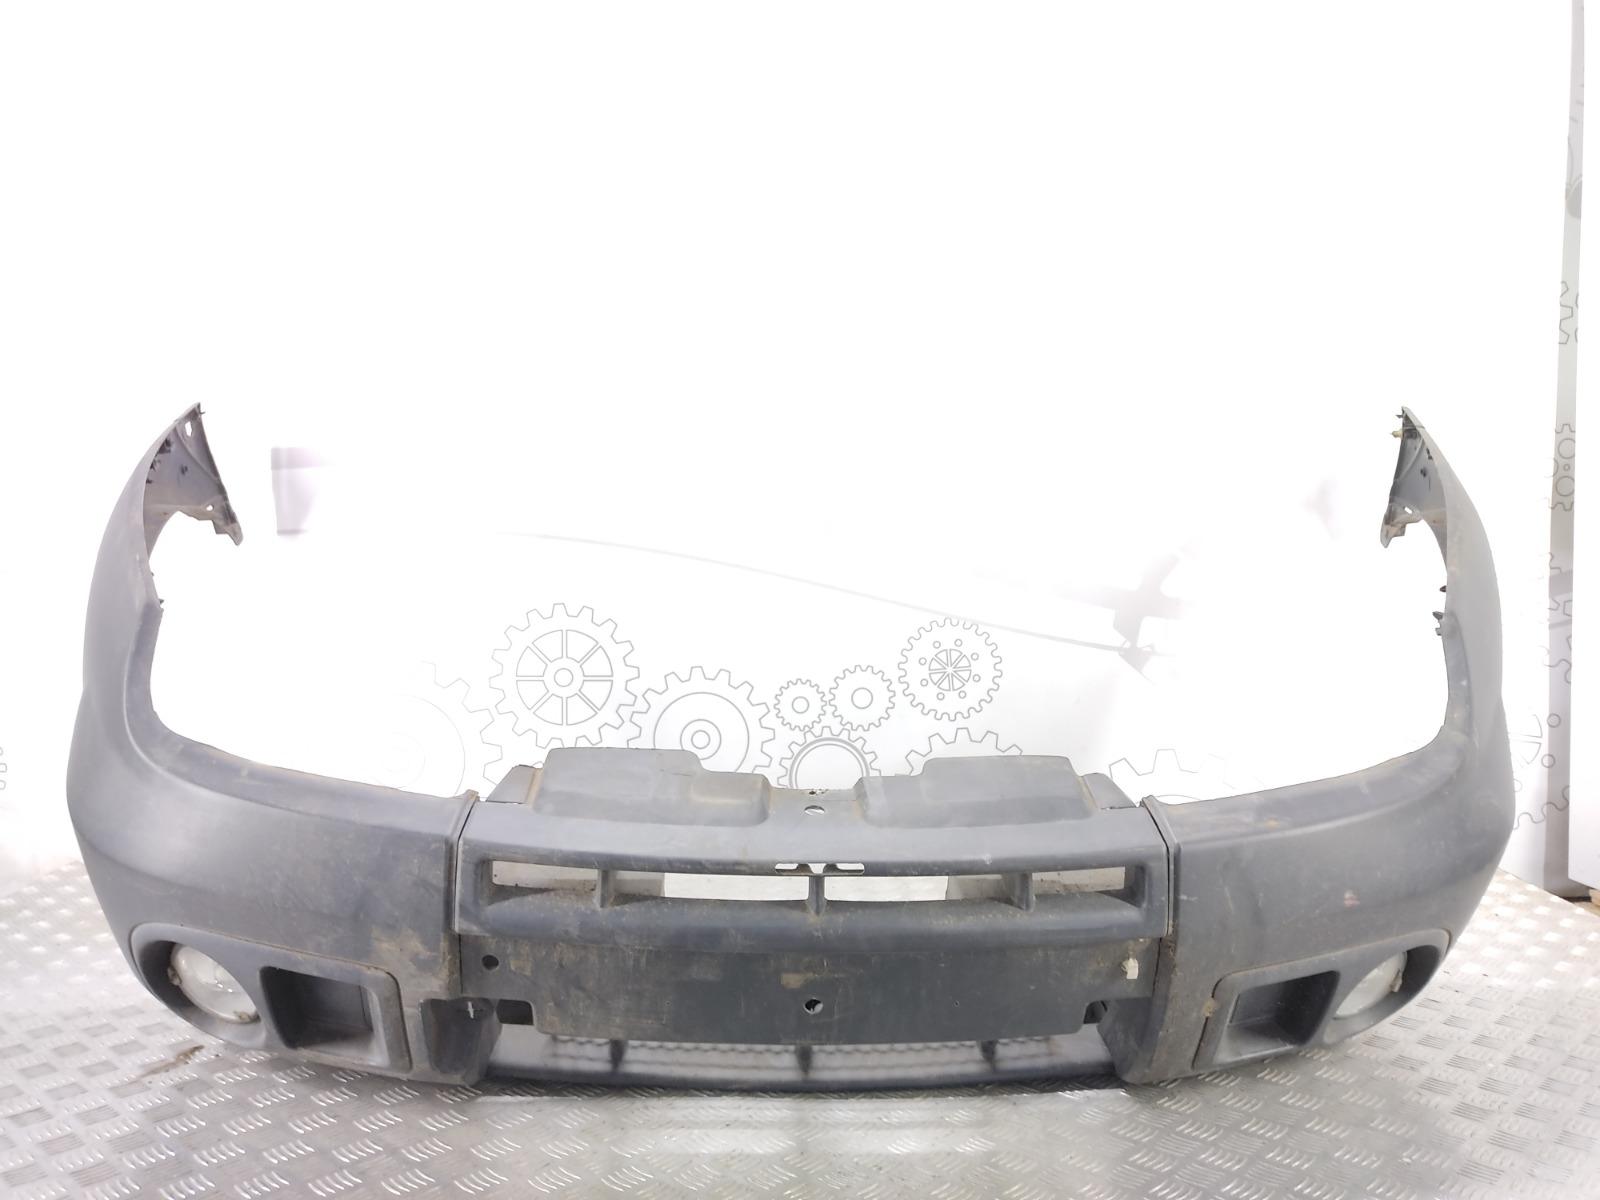 Бампер передний Renault Scenic Rx4 2.0 I 2001 (б/у)